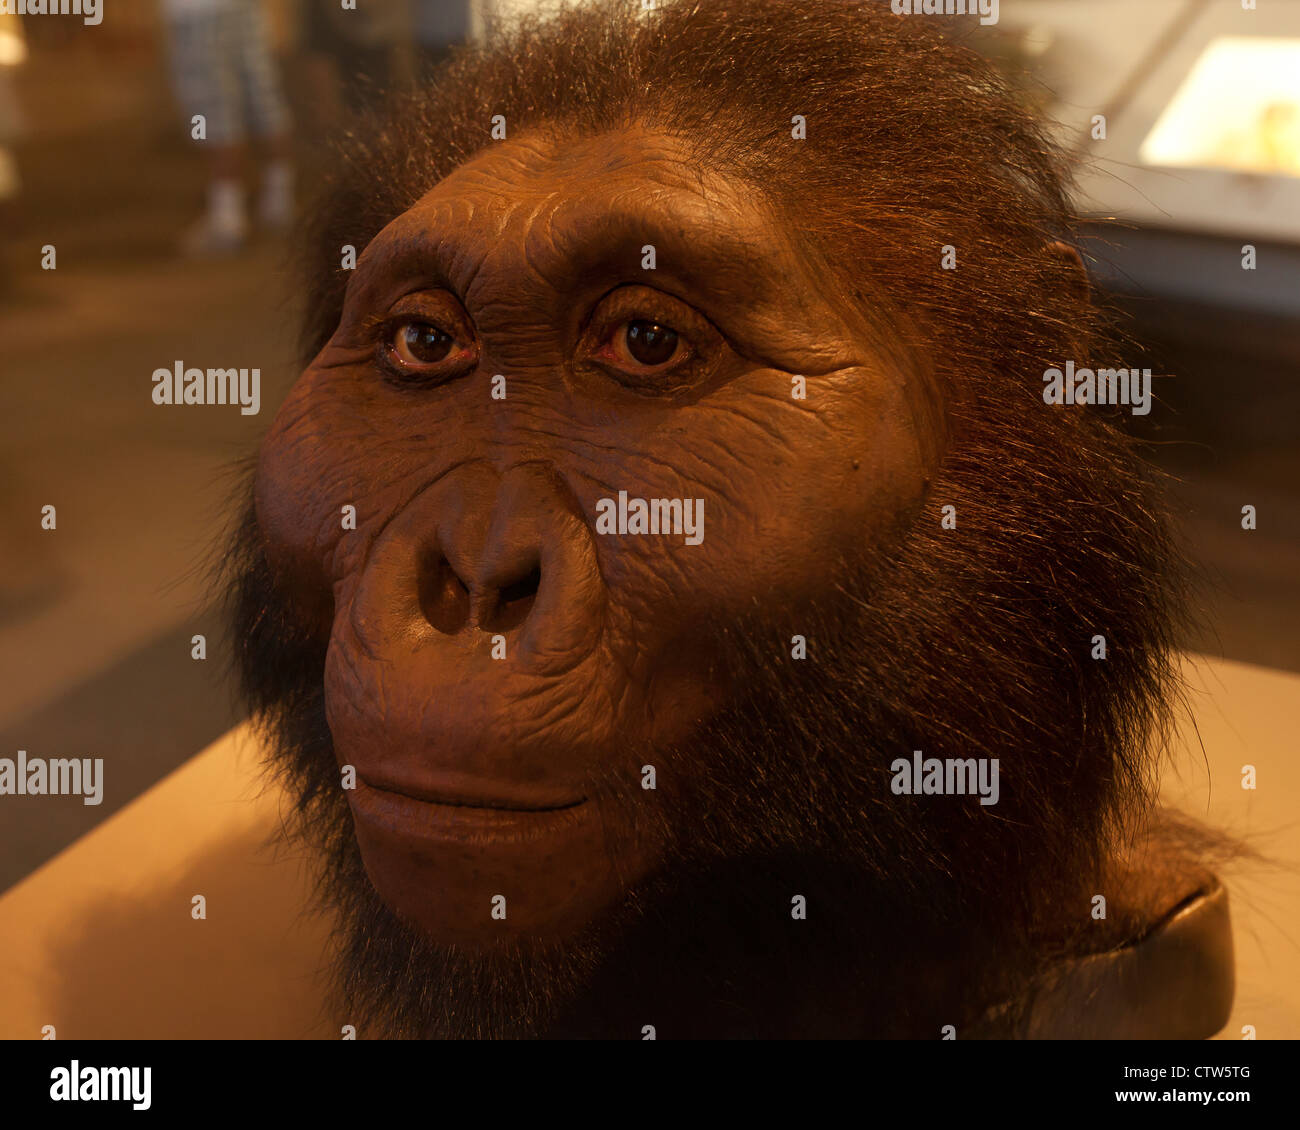 Paranthropus boisei reconstruction - American Museum of Natural History, Washington, DC - Stock Image